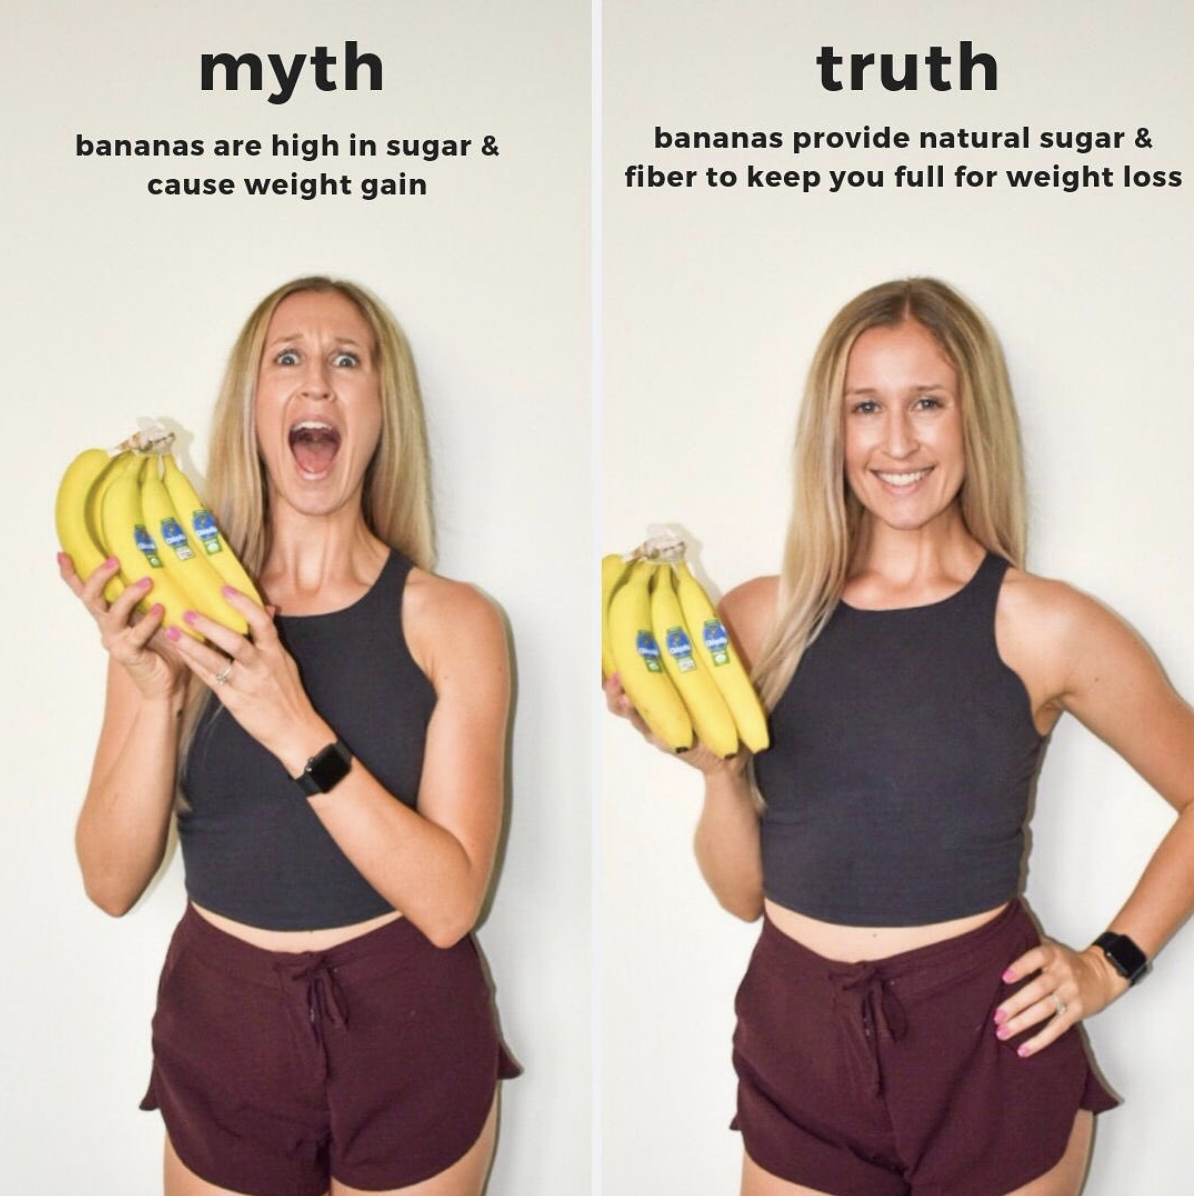 banana weight gain myth truth